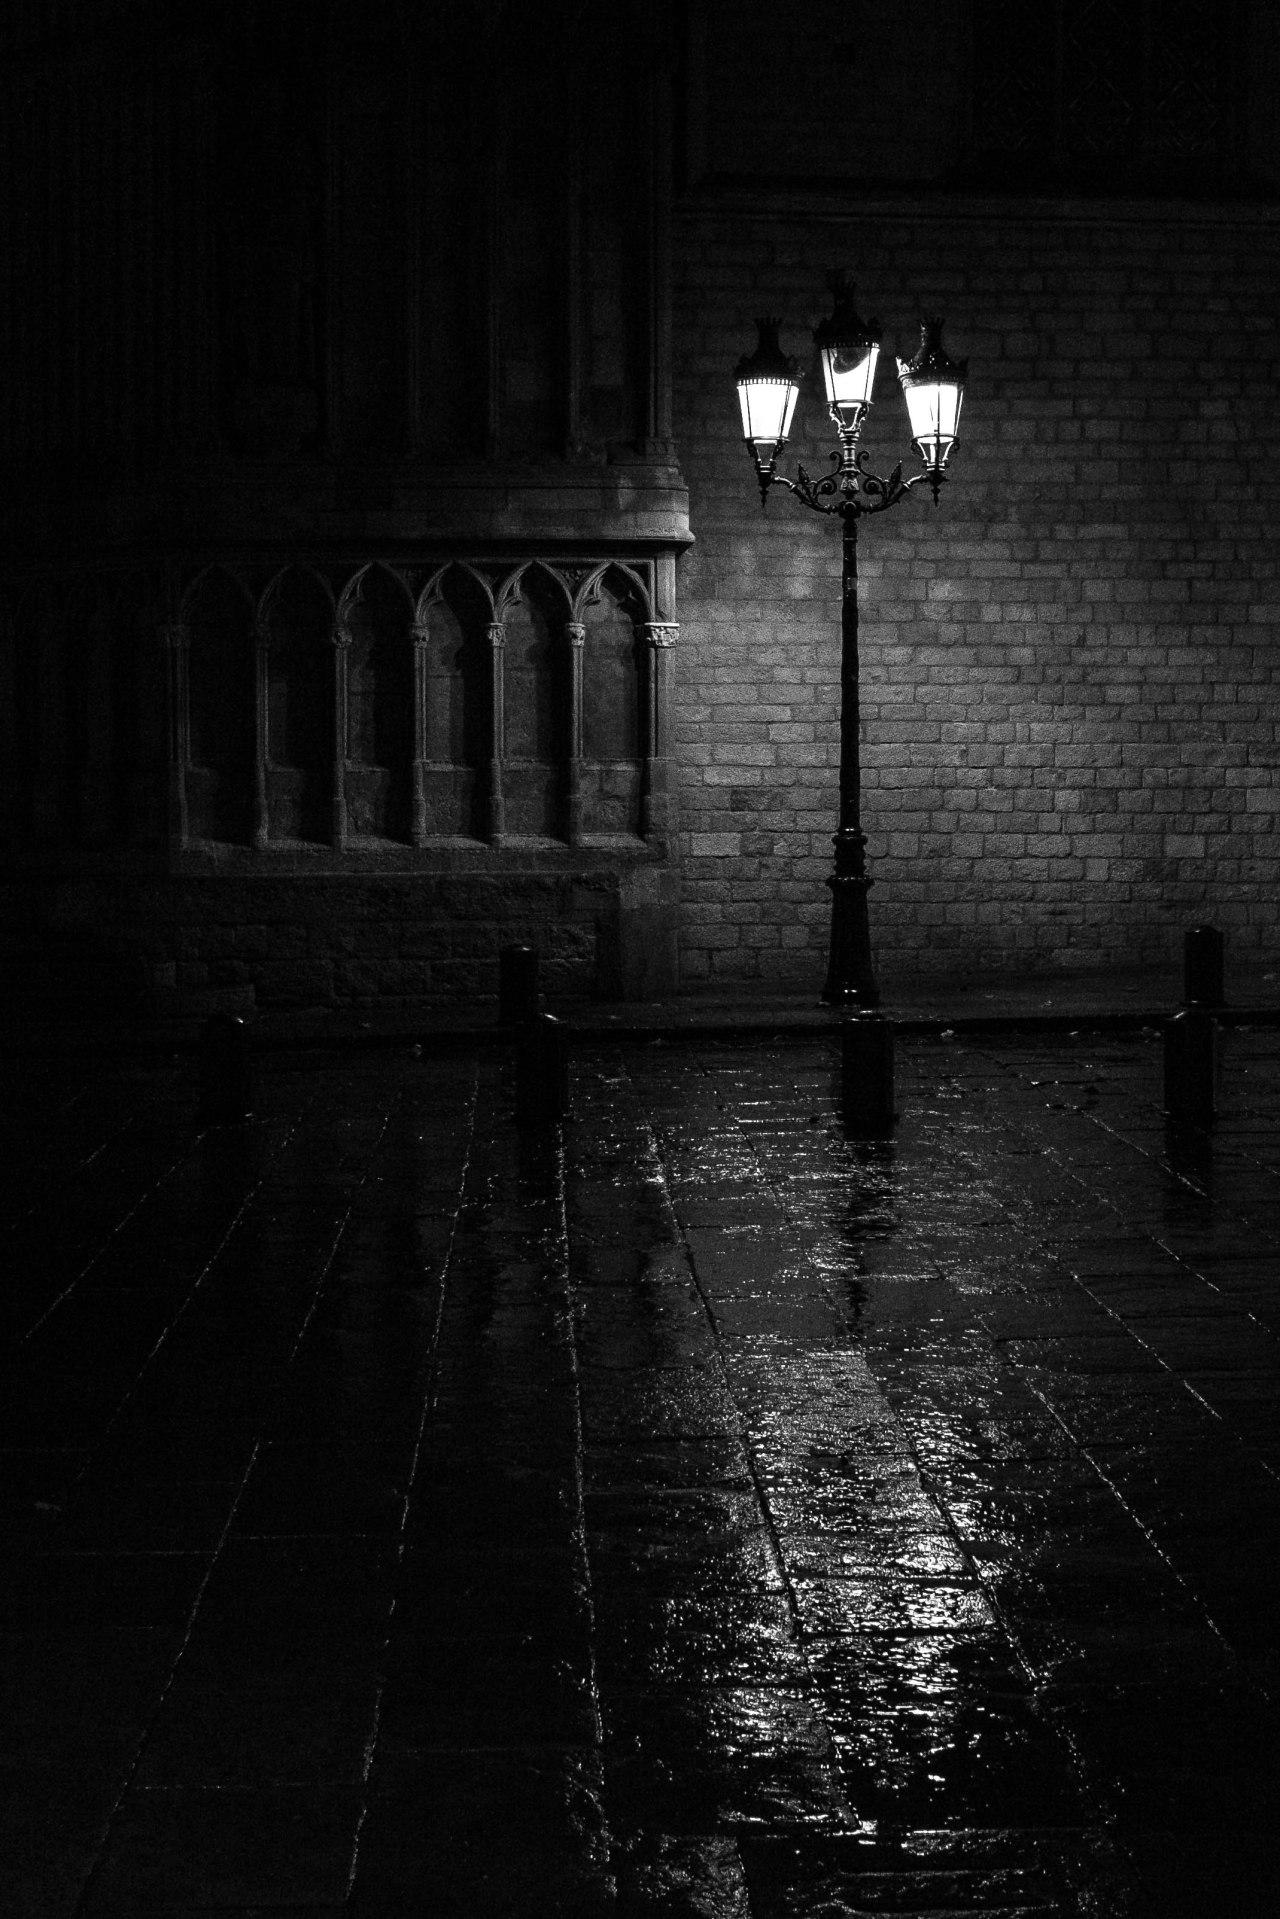 Composición fotográfica nocturna